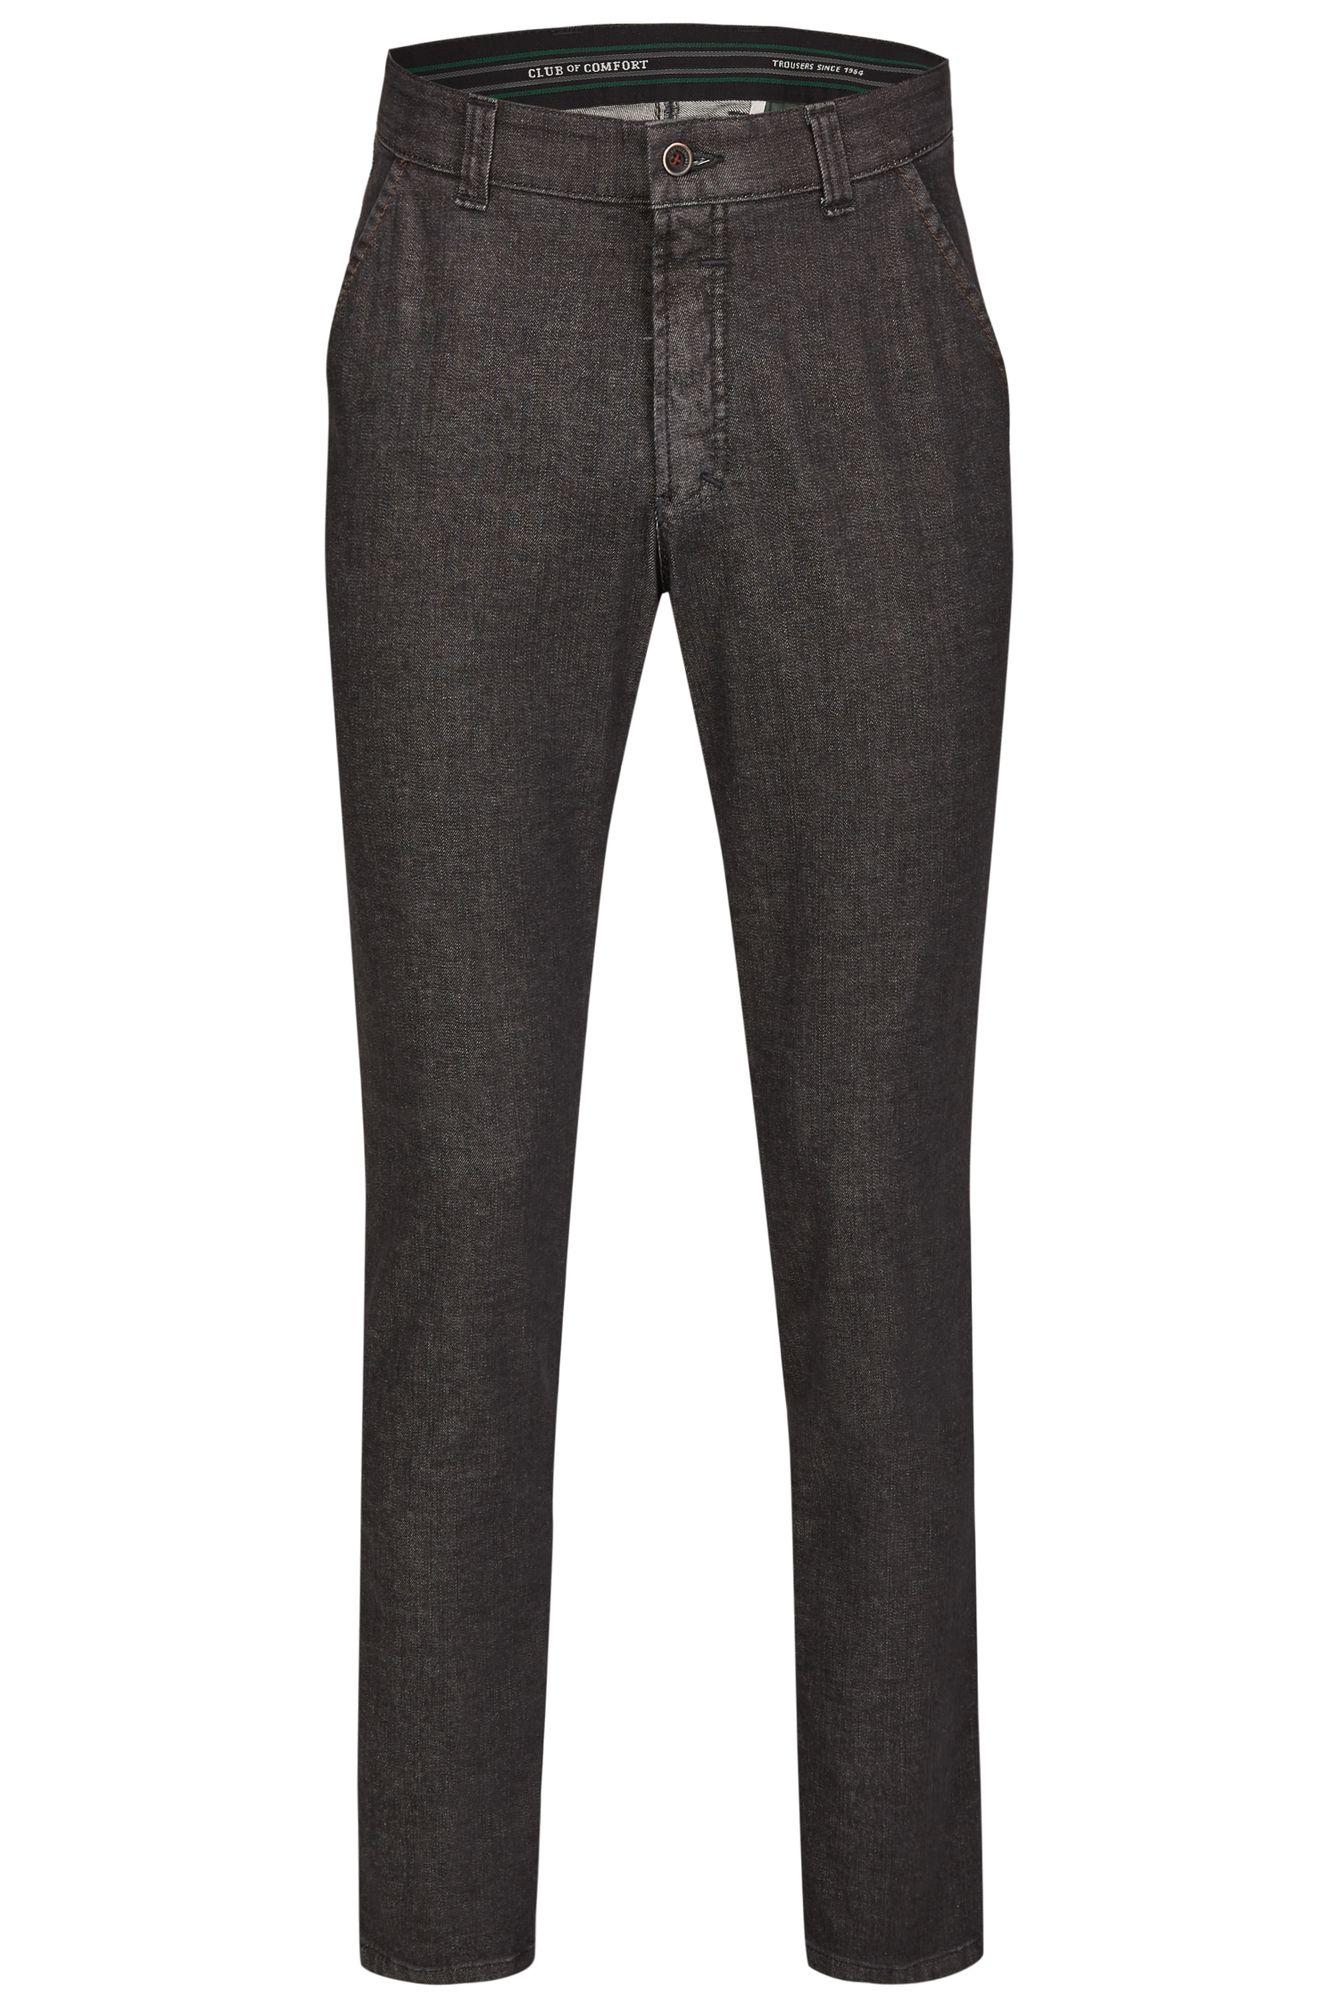 billig für Rabatt professioneller Verkauf offizielle Fotos Club of Comfort - Herren Swing-Pocket Hose, Marvin (6818)